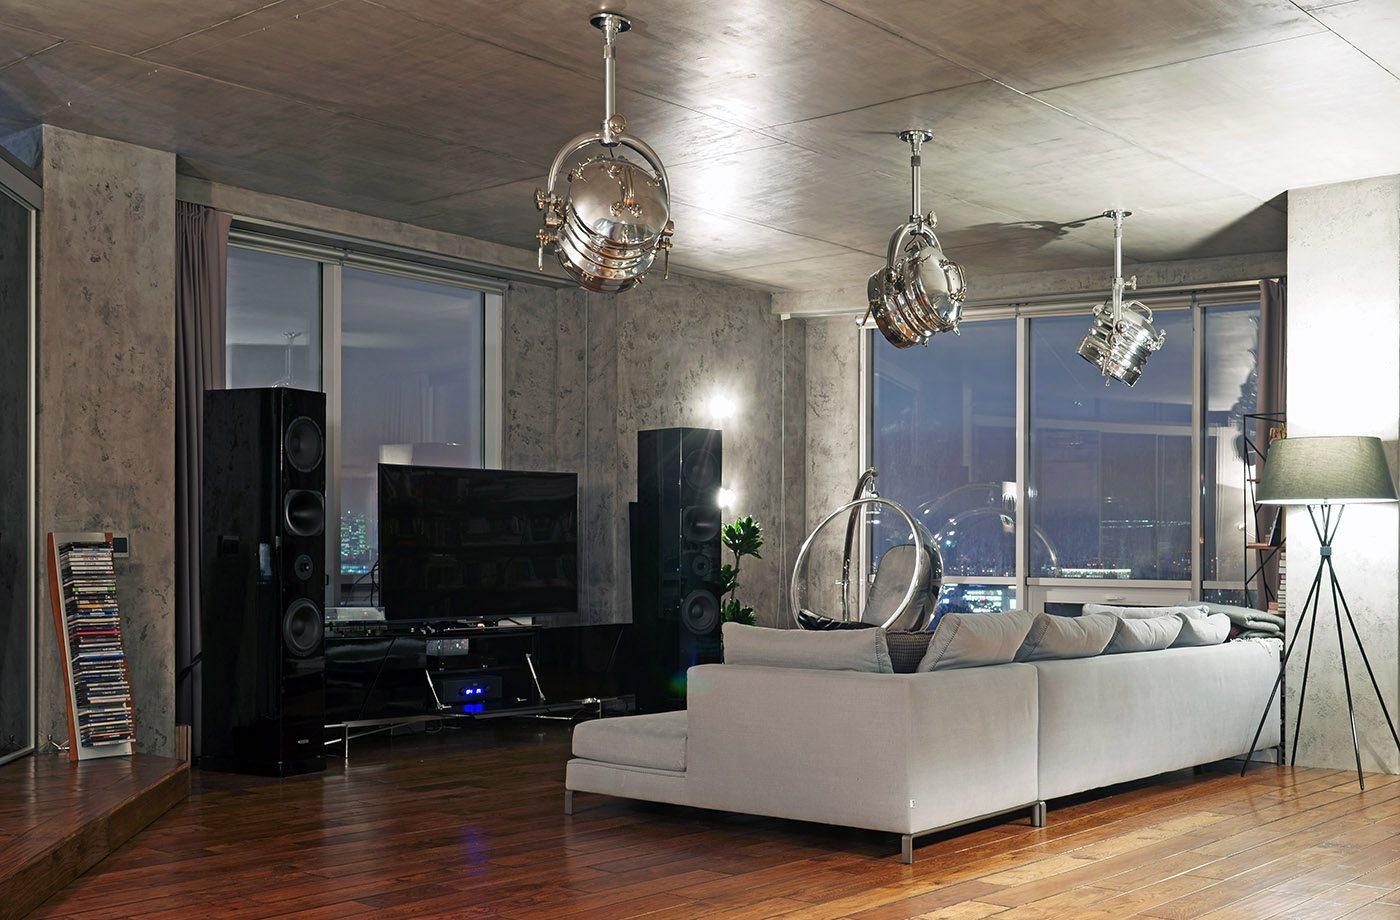 Masterhorn_in_studio_apartment_11.jpg